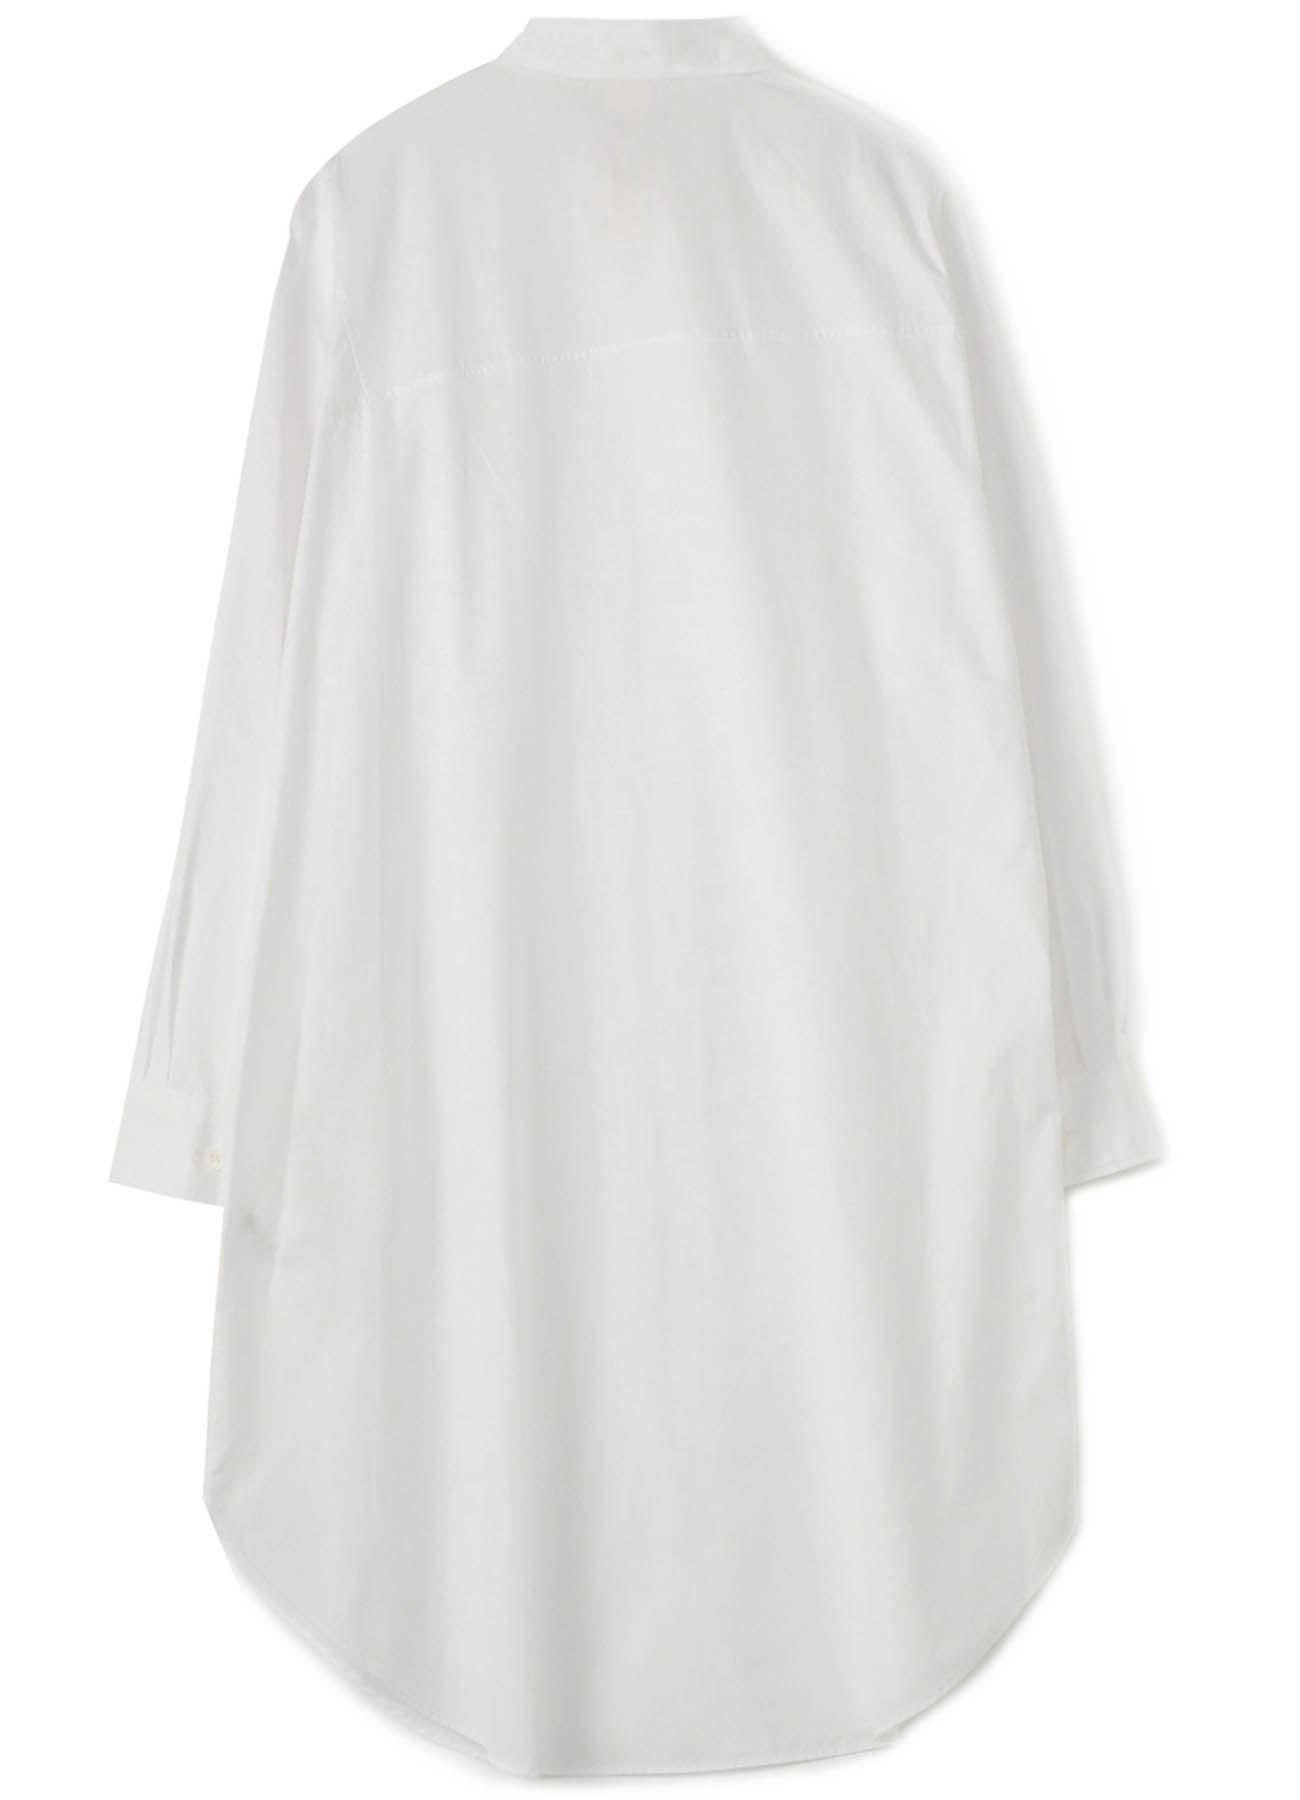 Cotton Broad Asymmetry Switching Shirt